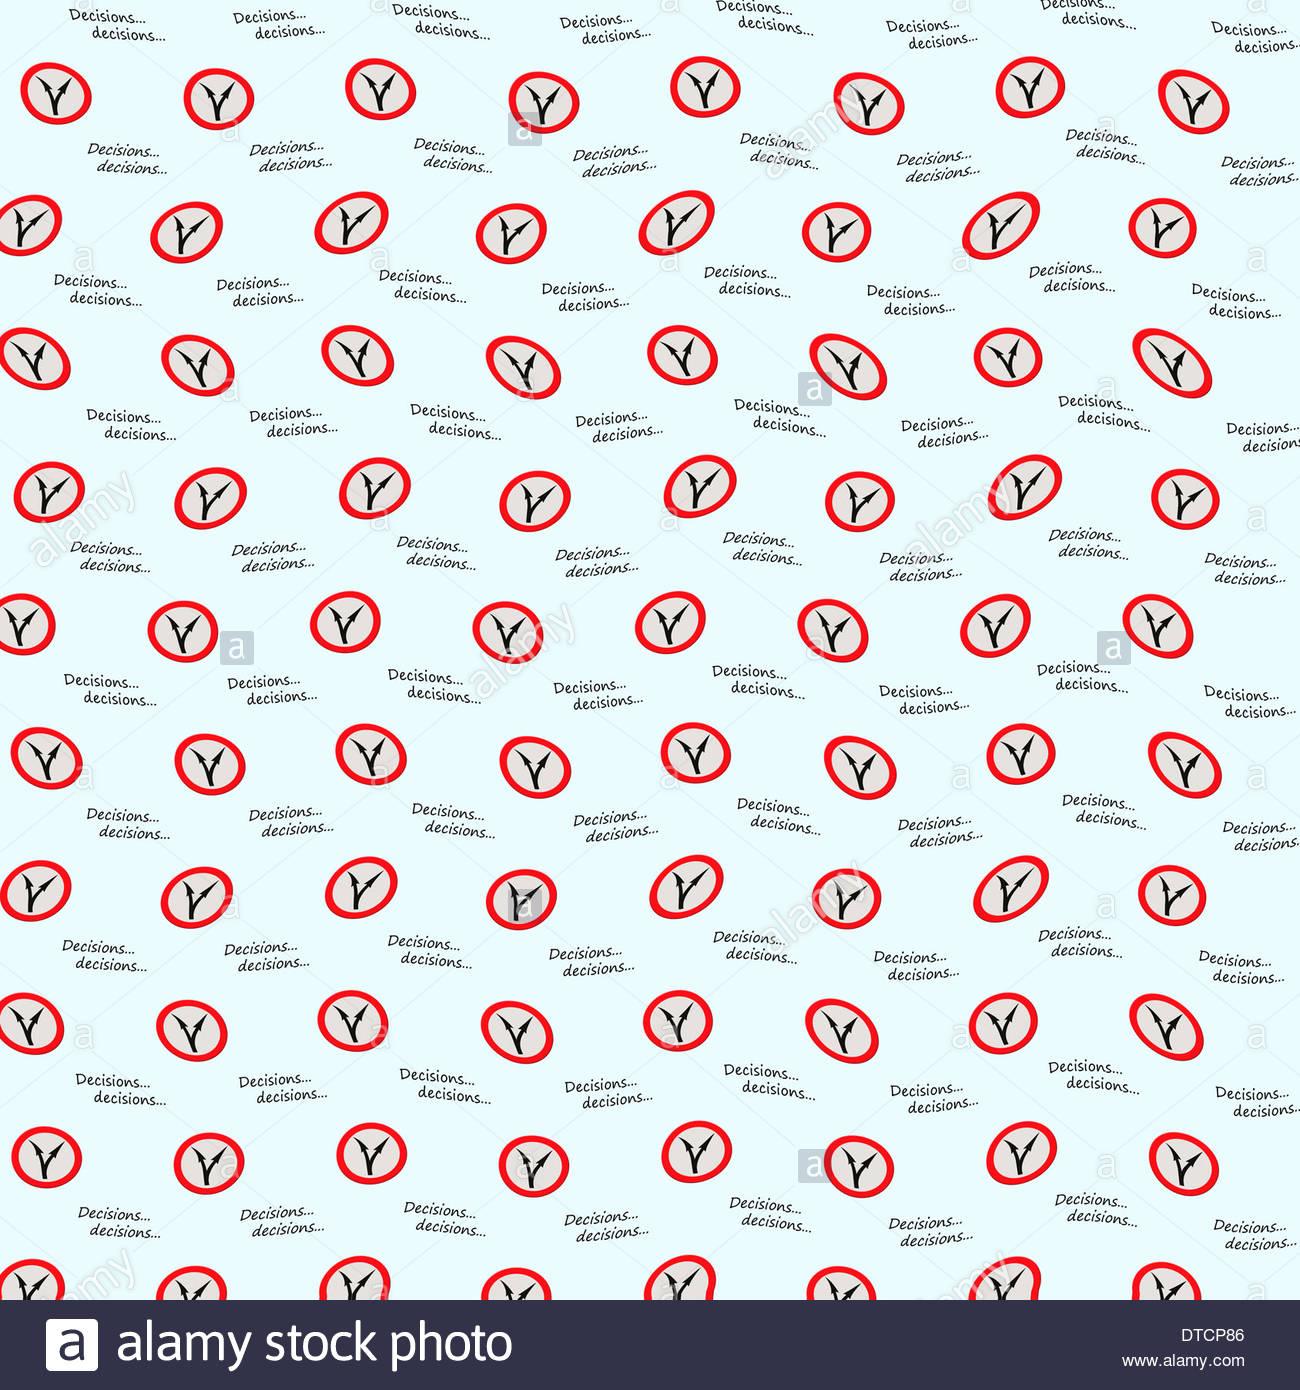 Digital Composition Concept - Decisions decisions wallpaper. - Stock Image